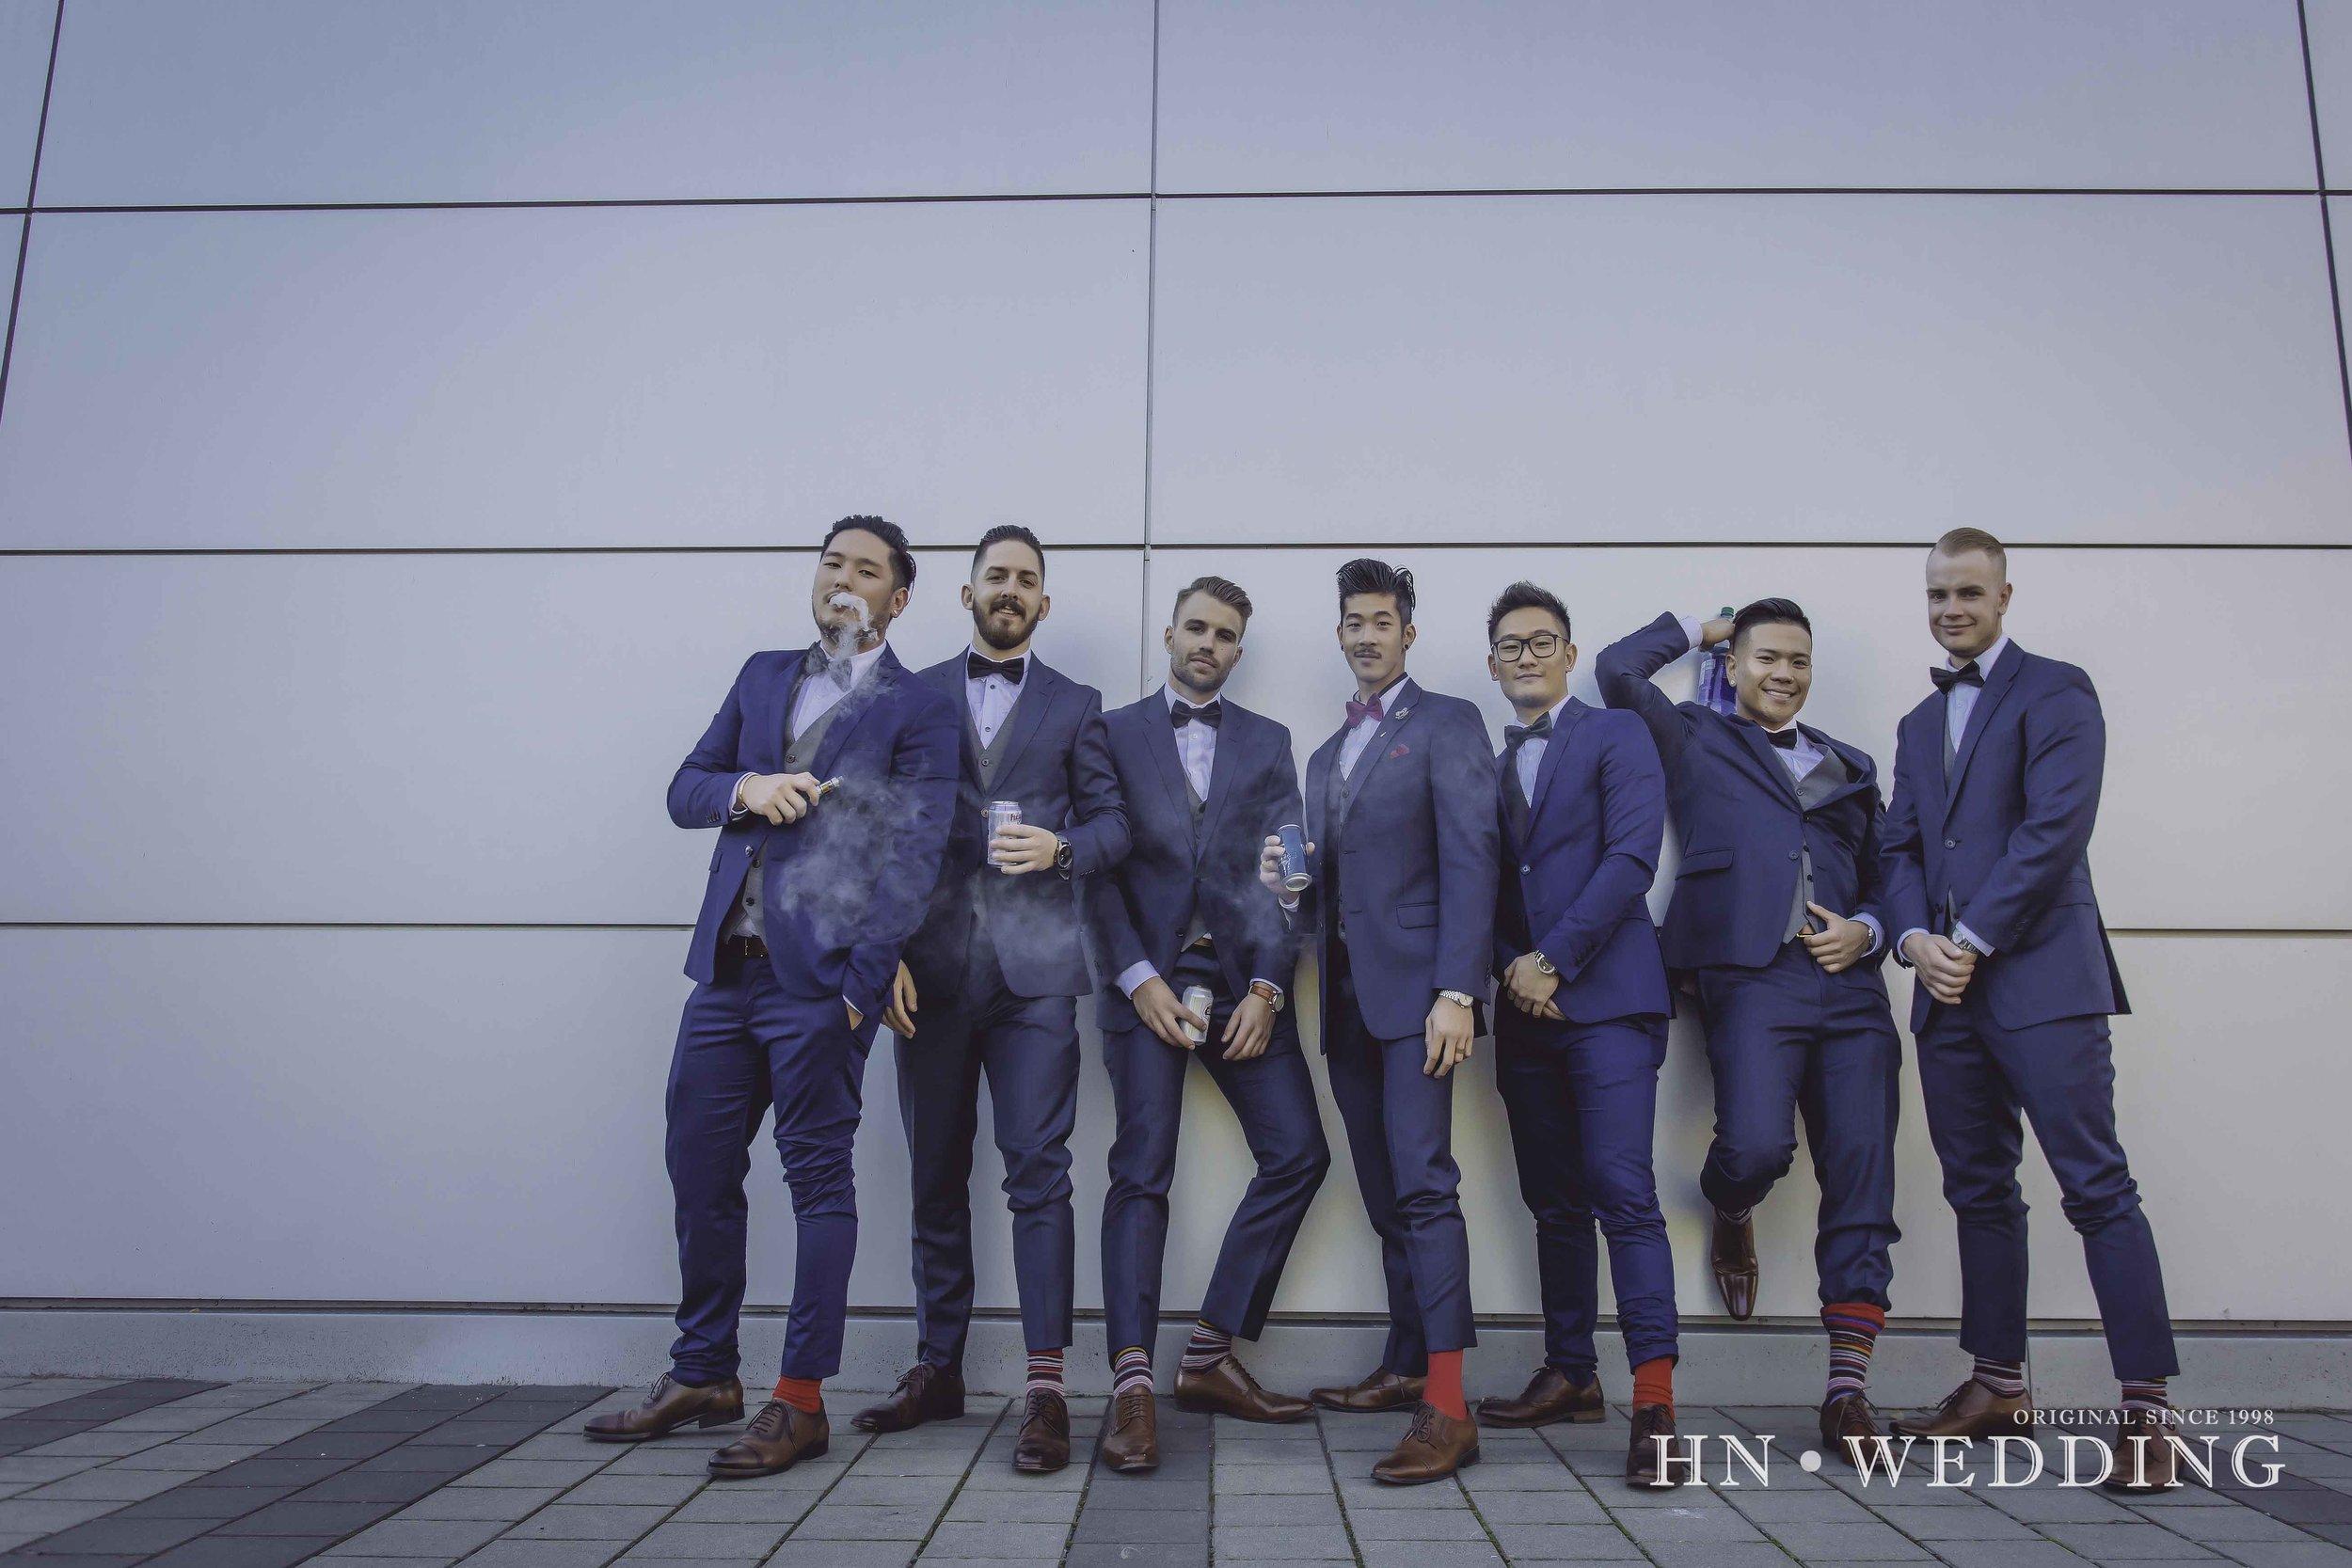 HNwedding-20160815-wedding-023.jpg